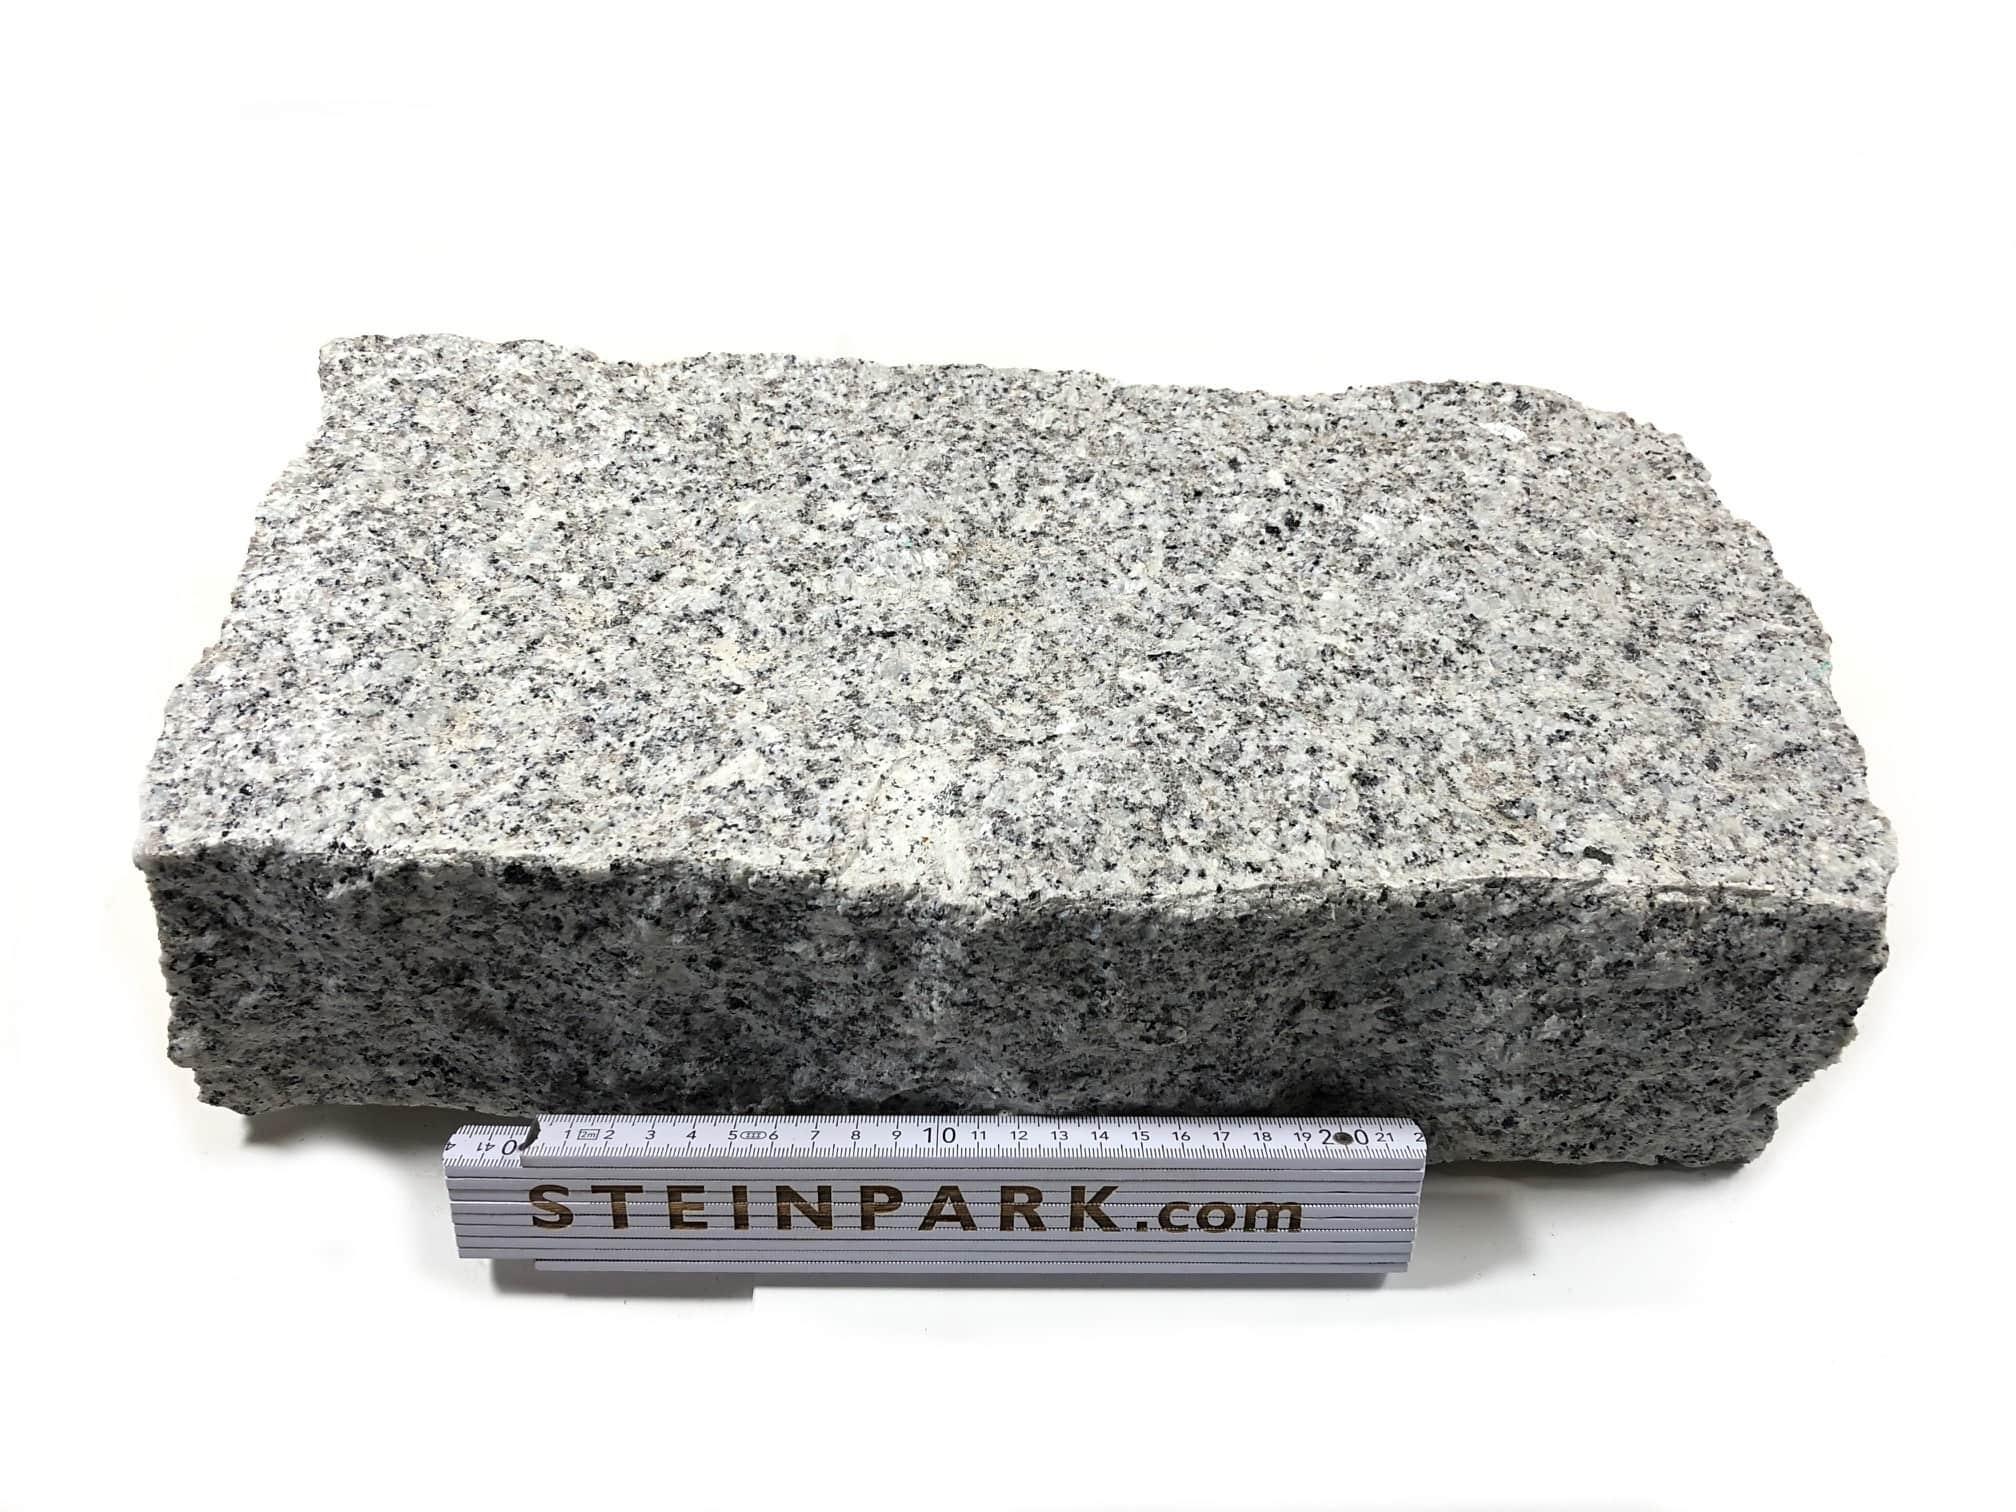 Granit Mauerstein 10x20x40 cm grau